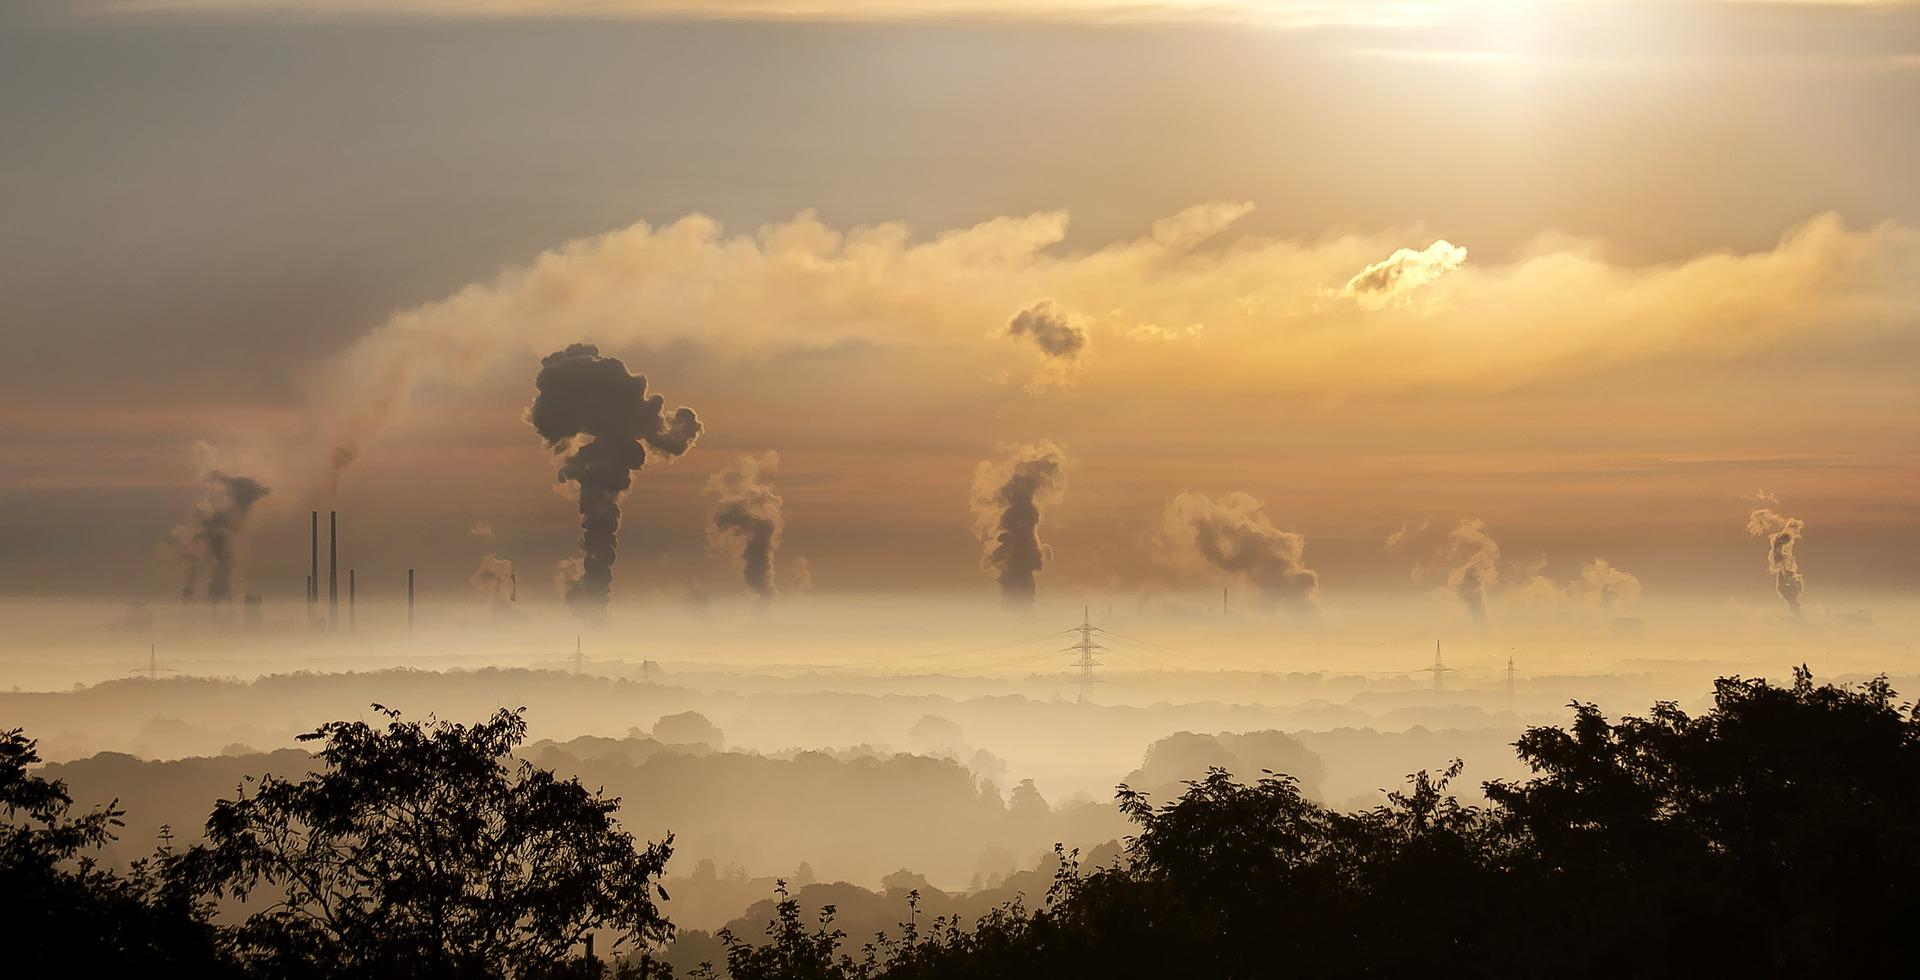 pollution, smog